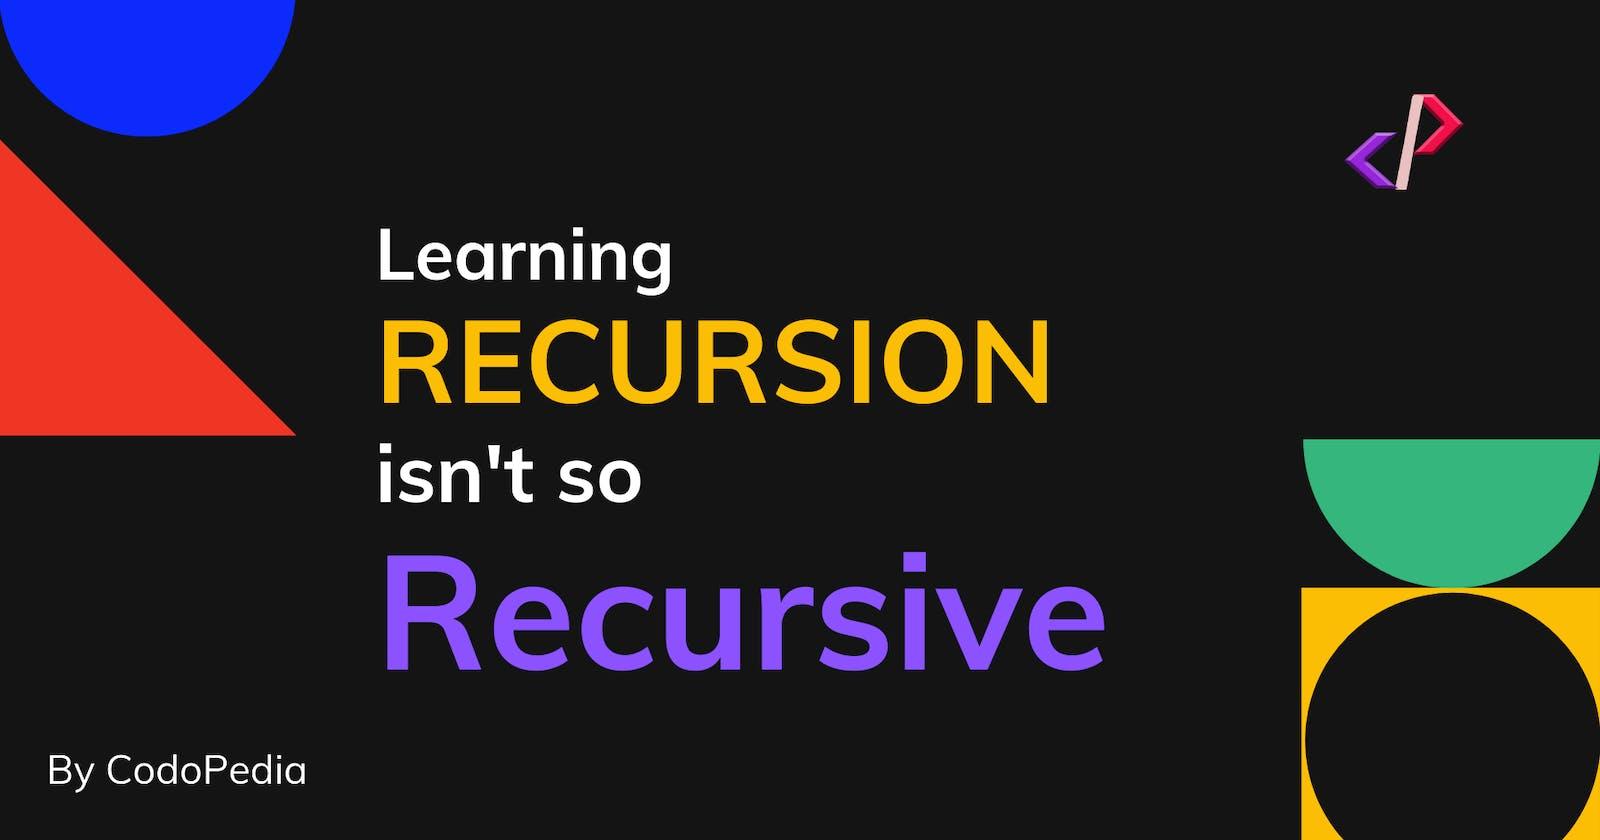 Learning RECURSION isn't so Recursive